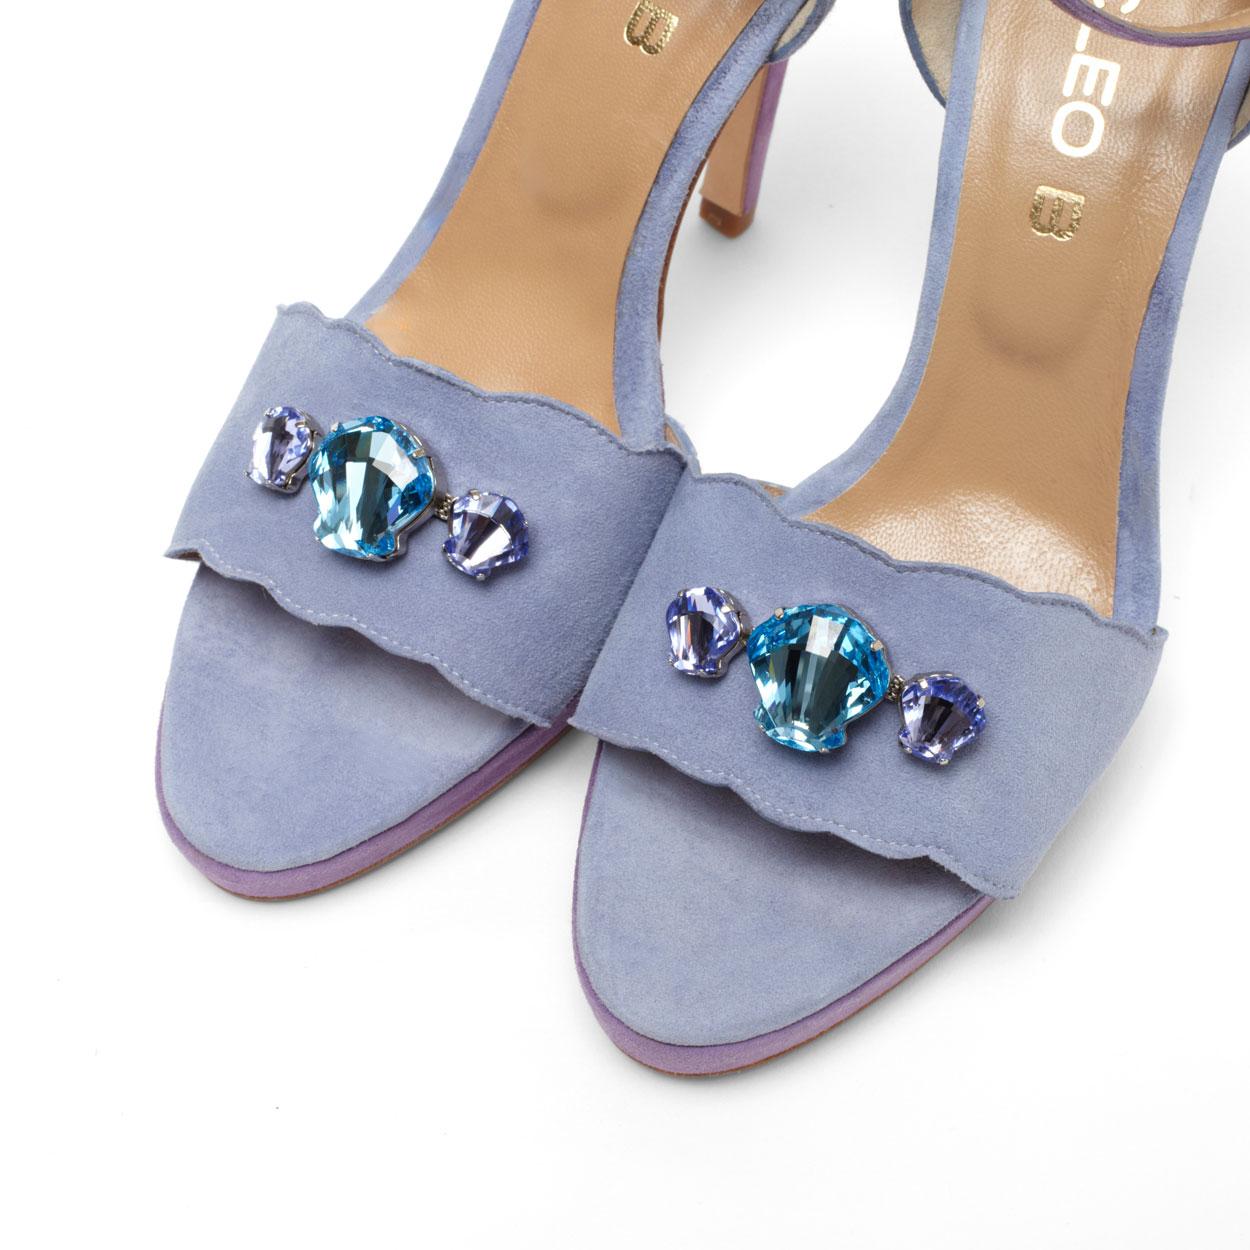 pepper-blue-lilac-toe-shoes-shoe-shopping-luxury-cleob-designer-design-london.jpg